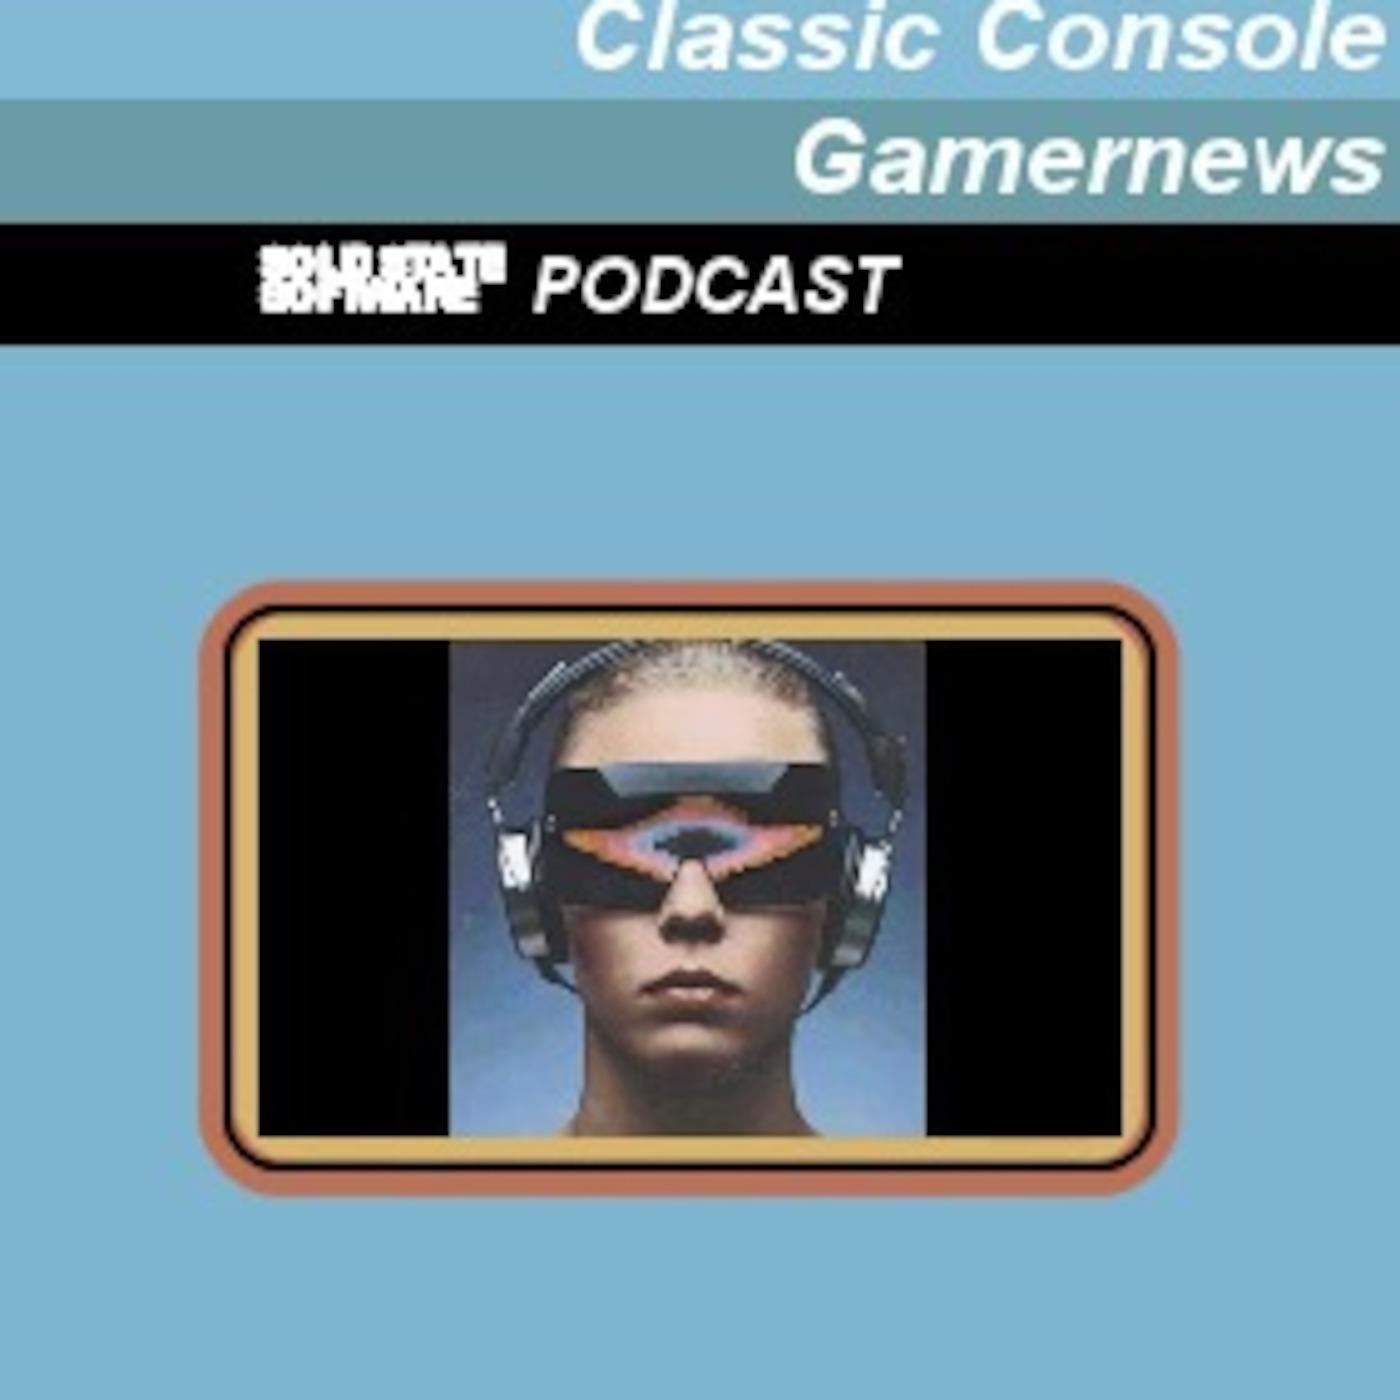 Classic Console Gamernews